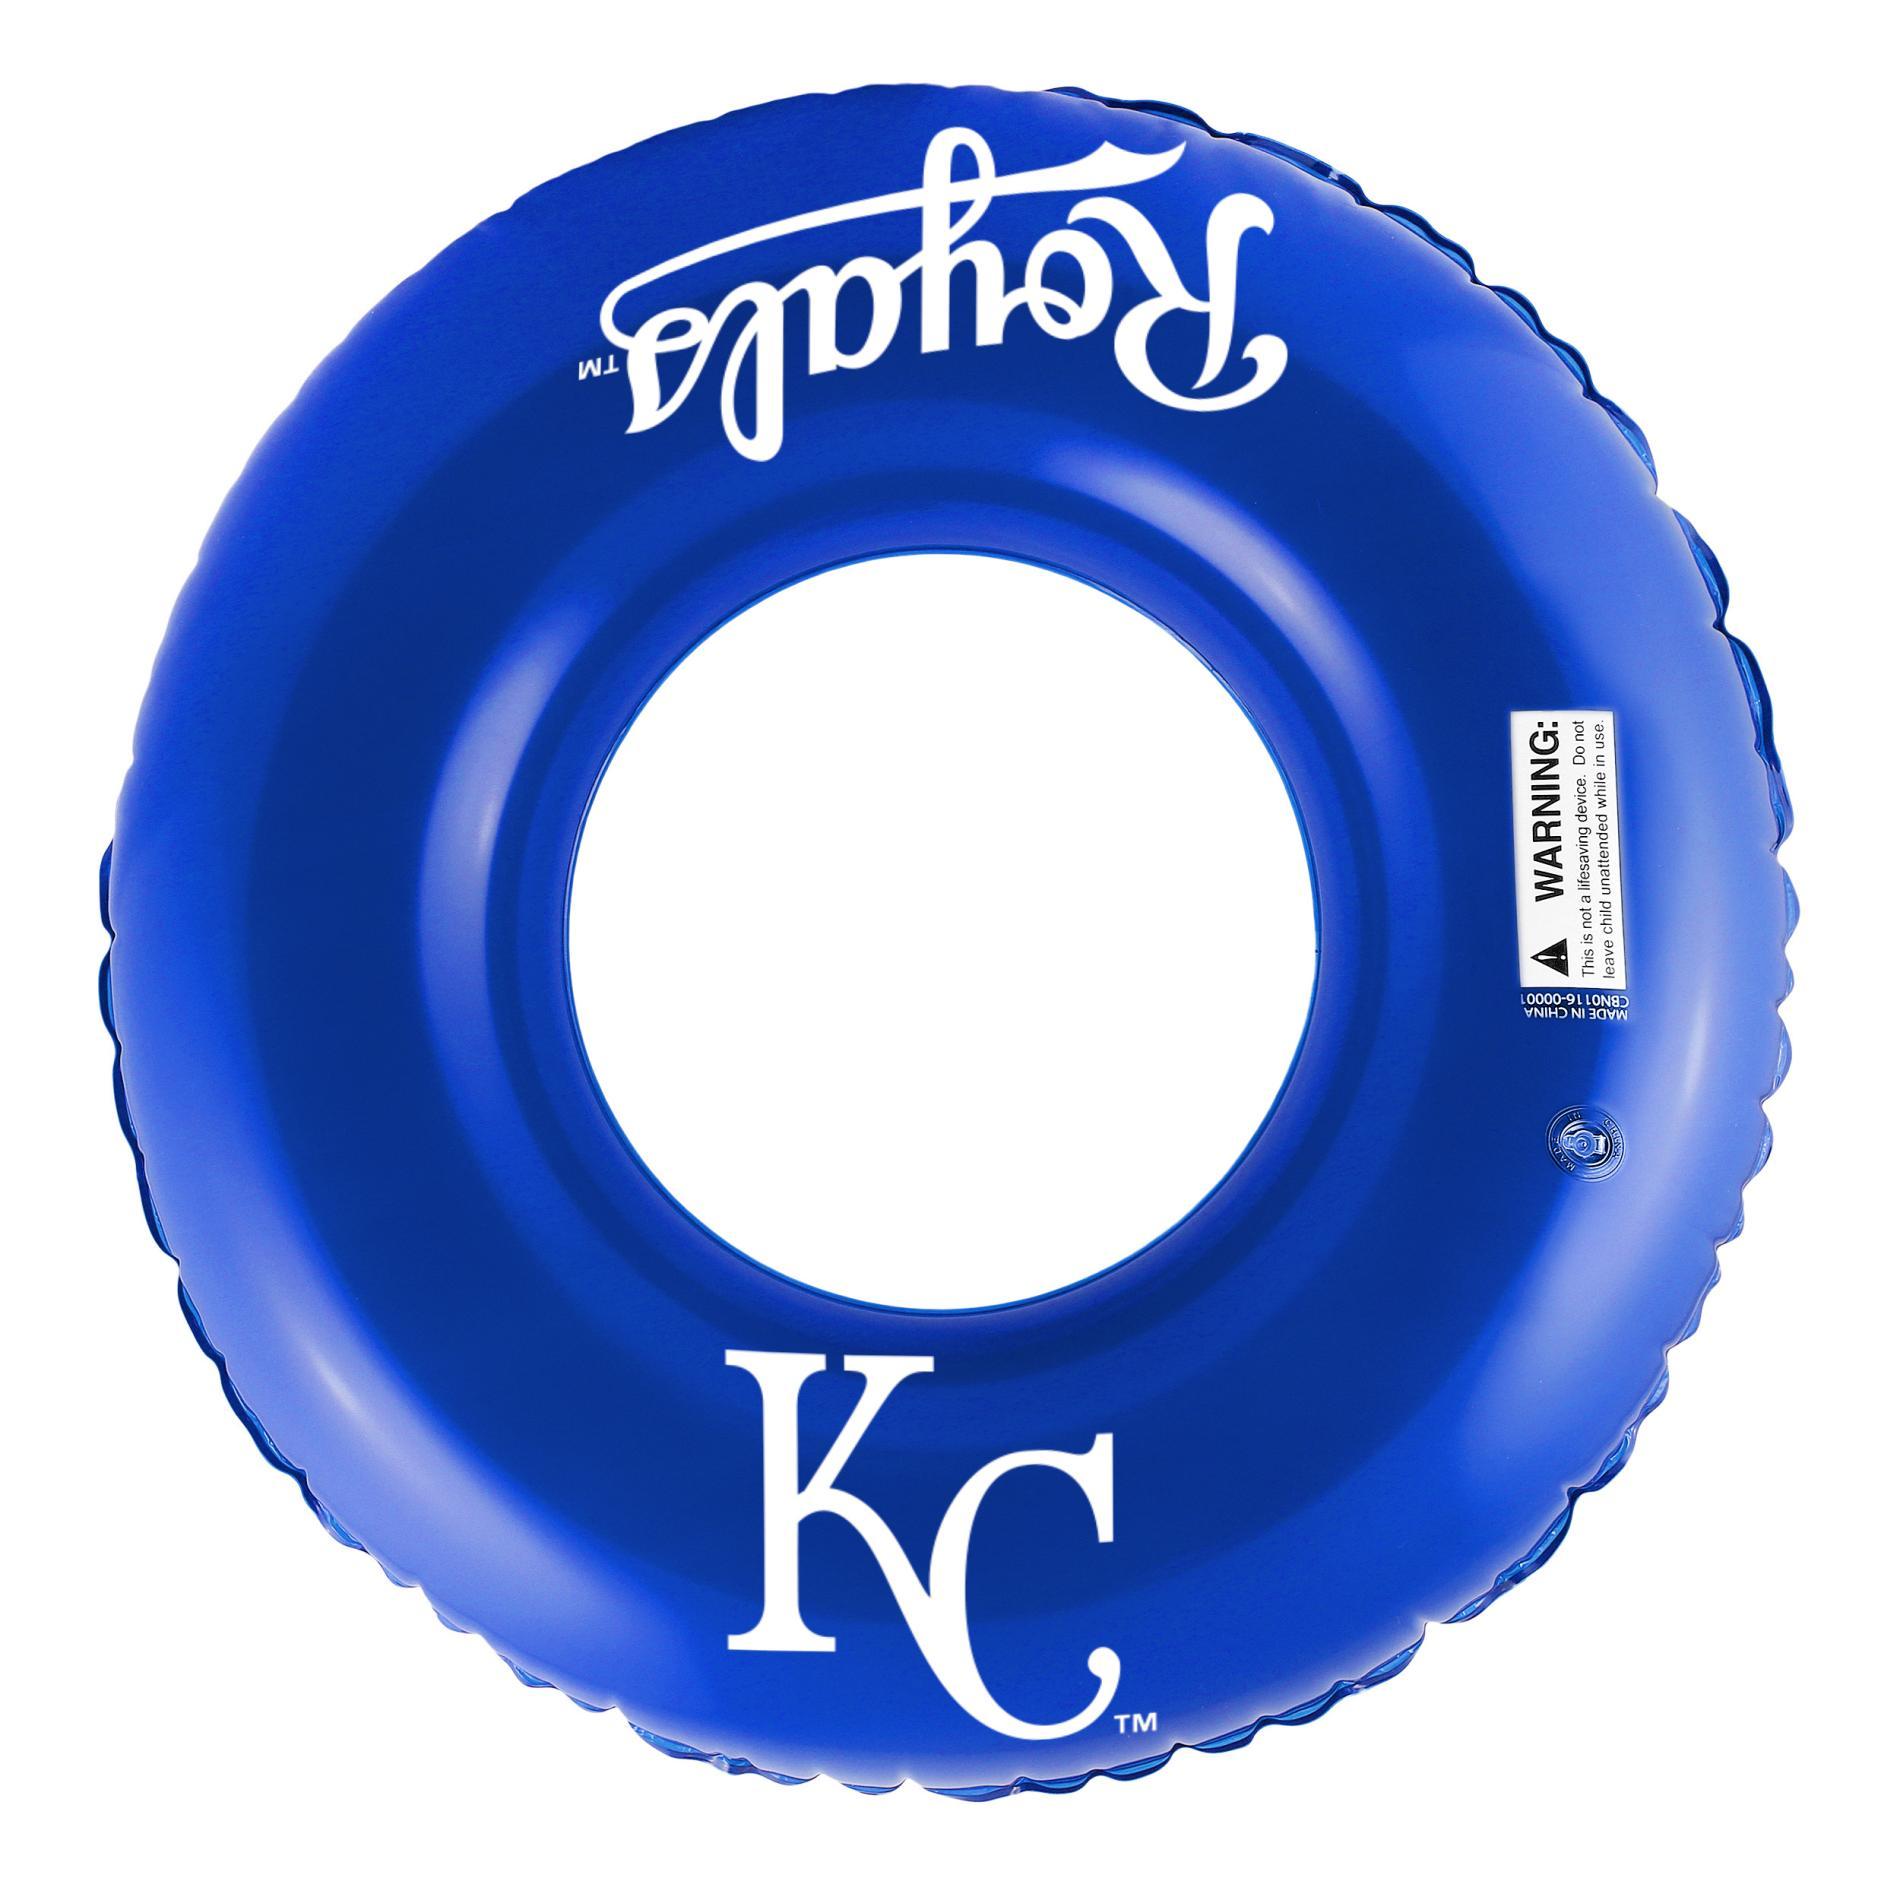 MLB Pool Inner Tube - Kansas City Royals PartNumber: 046W009533463001P KsnValue: 9533463 MfgPartNumber: BCMBTUBEKR